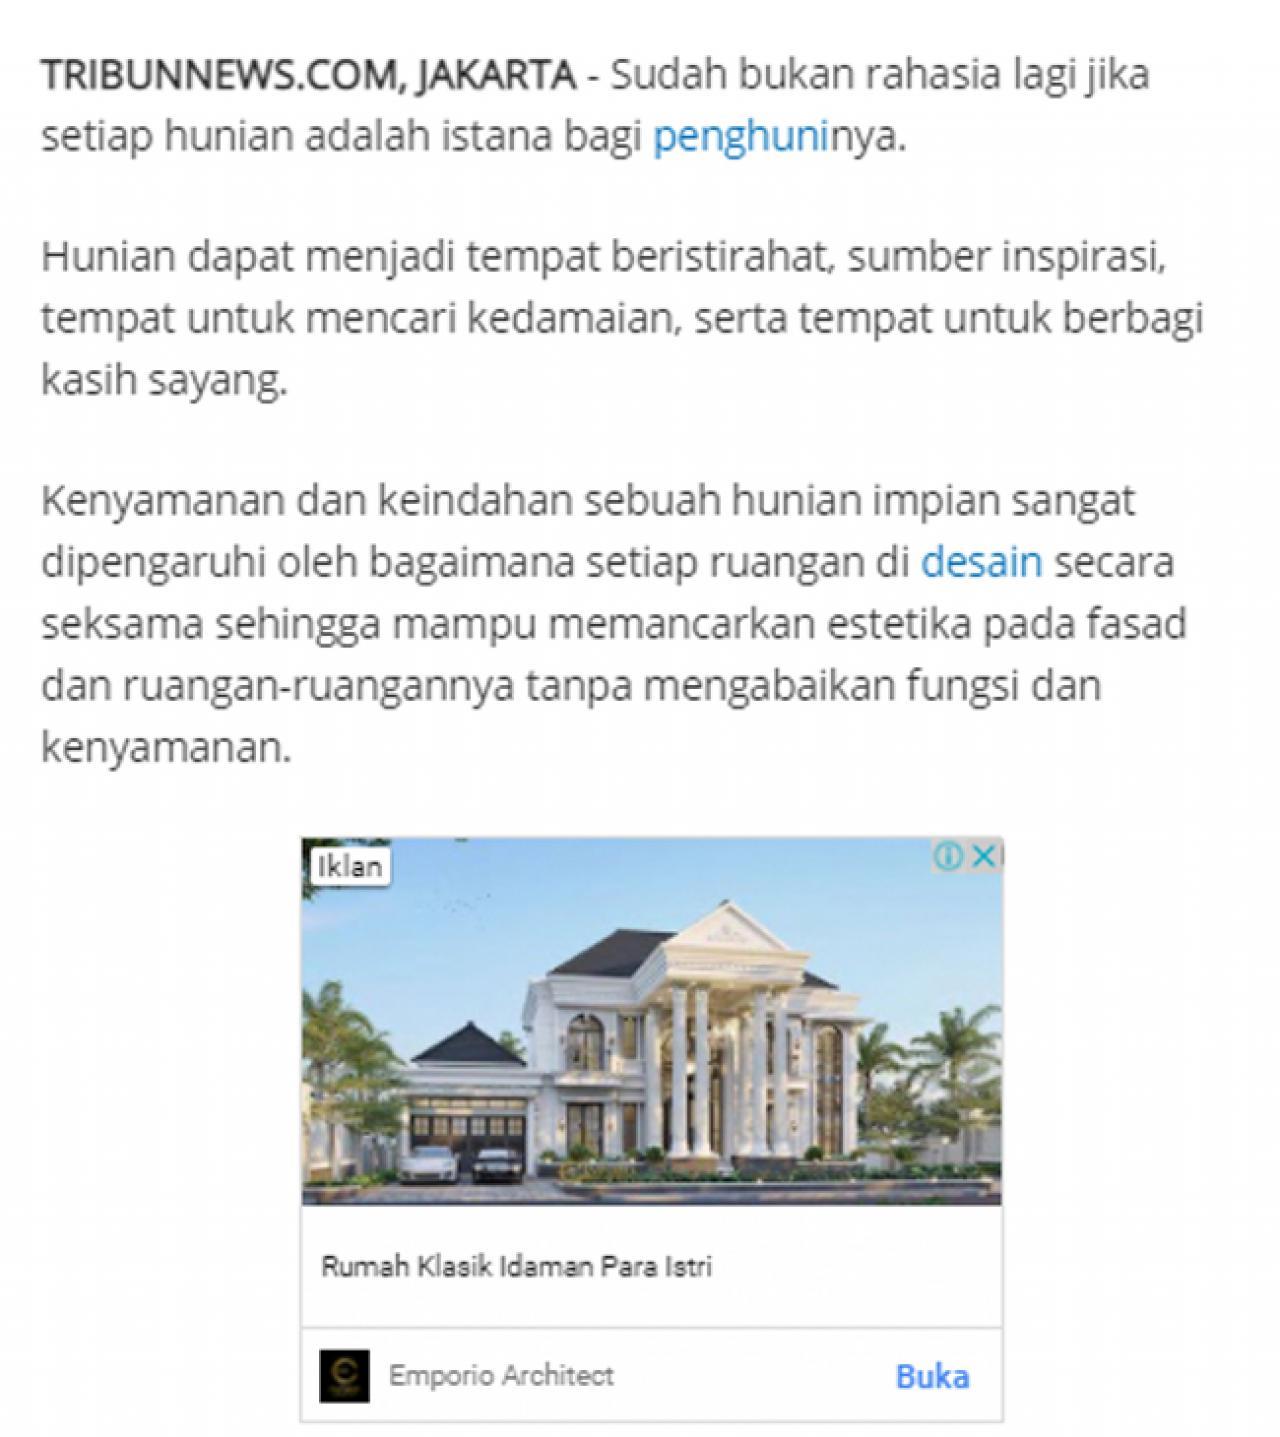 Ulasan Media TribunJakarta.com - Wujudkan Hunian Impian Bersama Emporio Architect, Karya Anak Bangsa yang Sukses Tembus Internasional 1 1